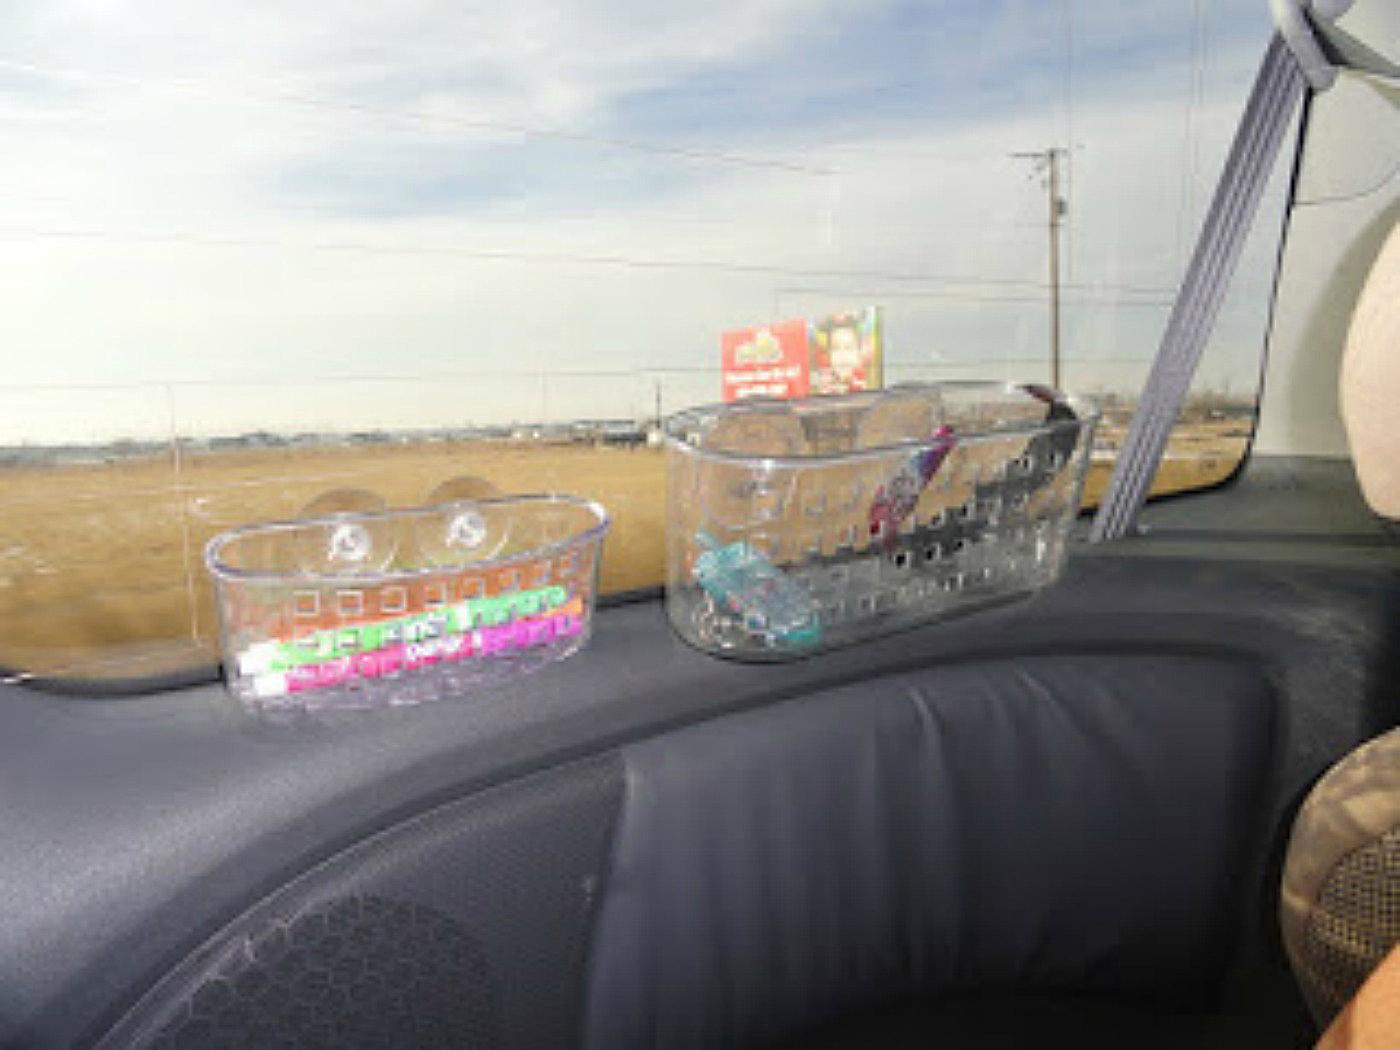 Pinterest_RoadTripHacks_SuctionCaddies.JPG